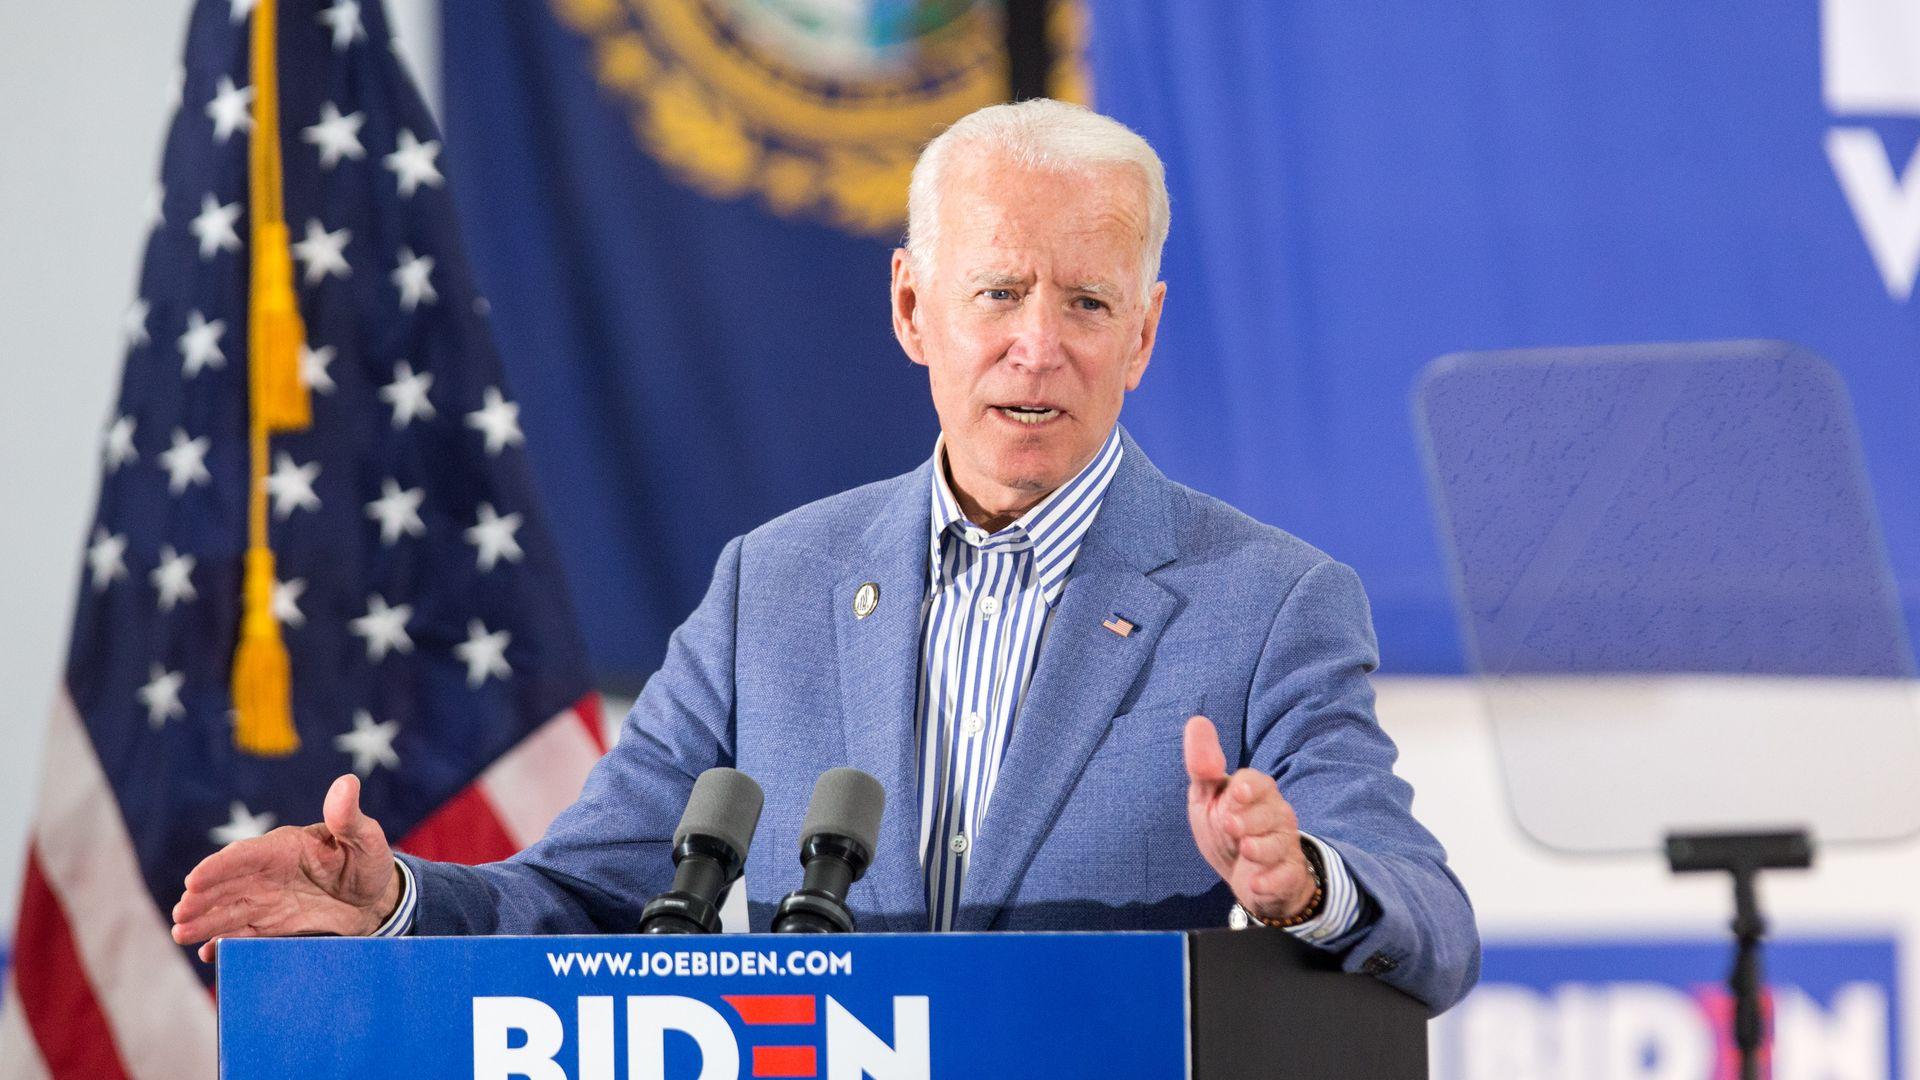 Joe Biden giving a speech in New Hampshire